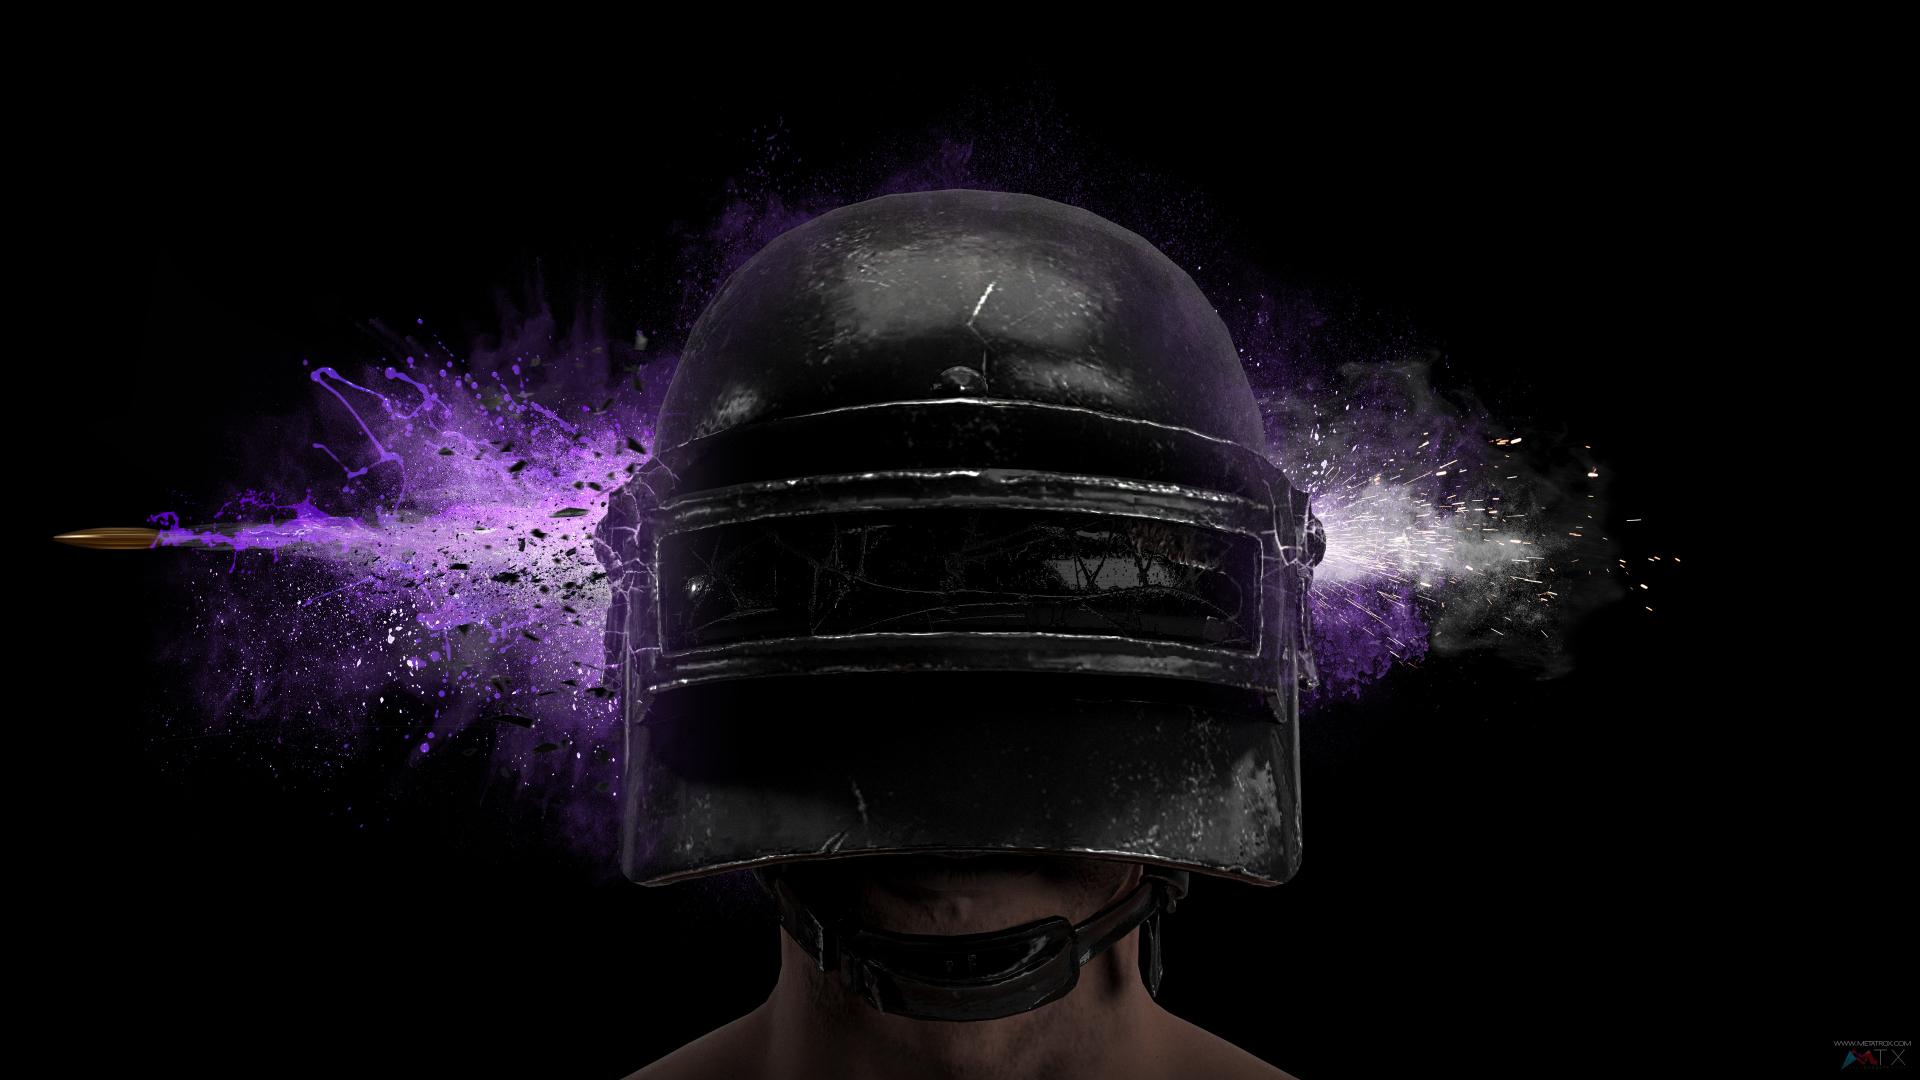 Download 1920x1080 Wallpaper Pubg Video Game Bullet Through Helmet